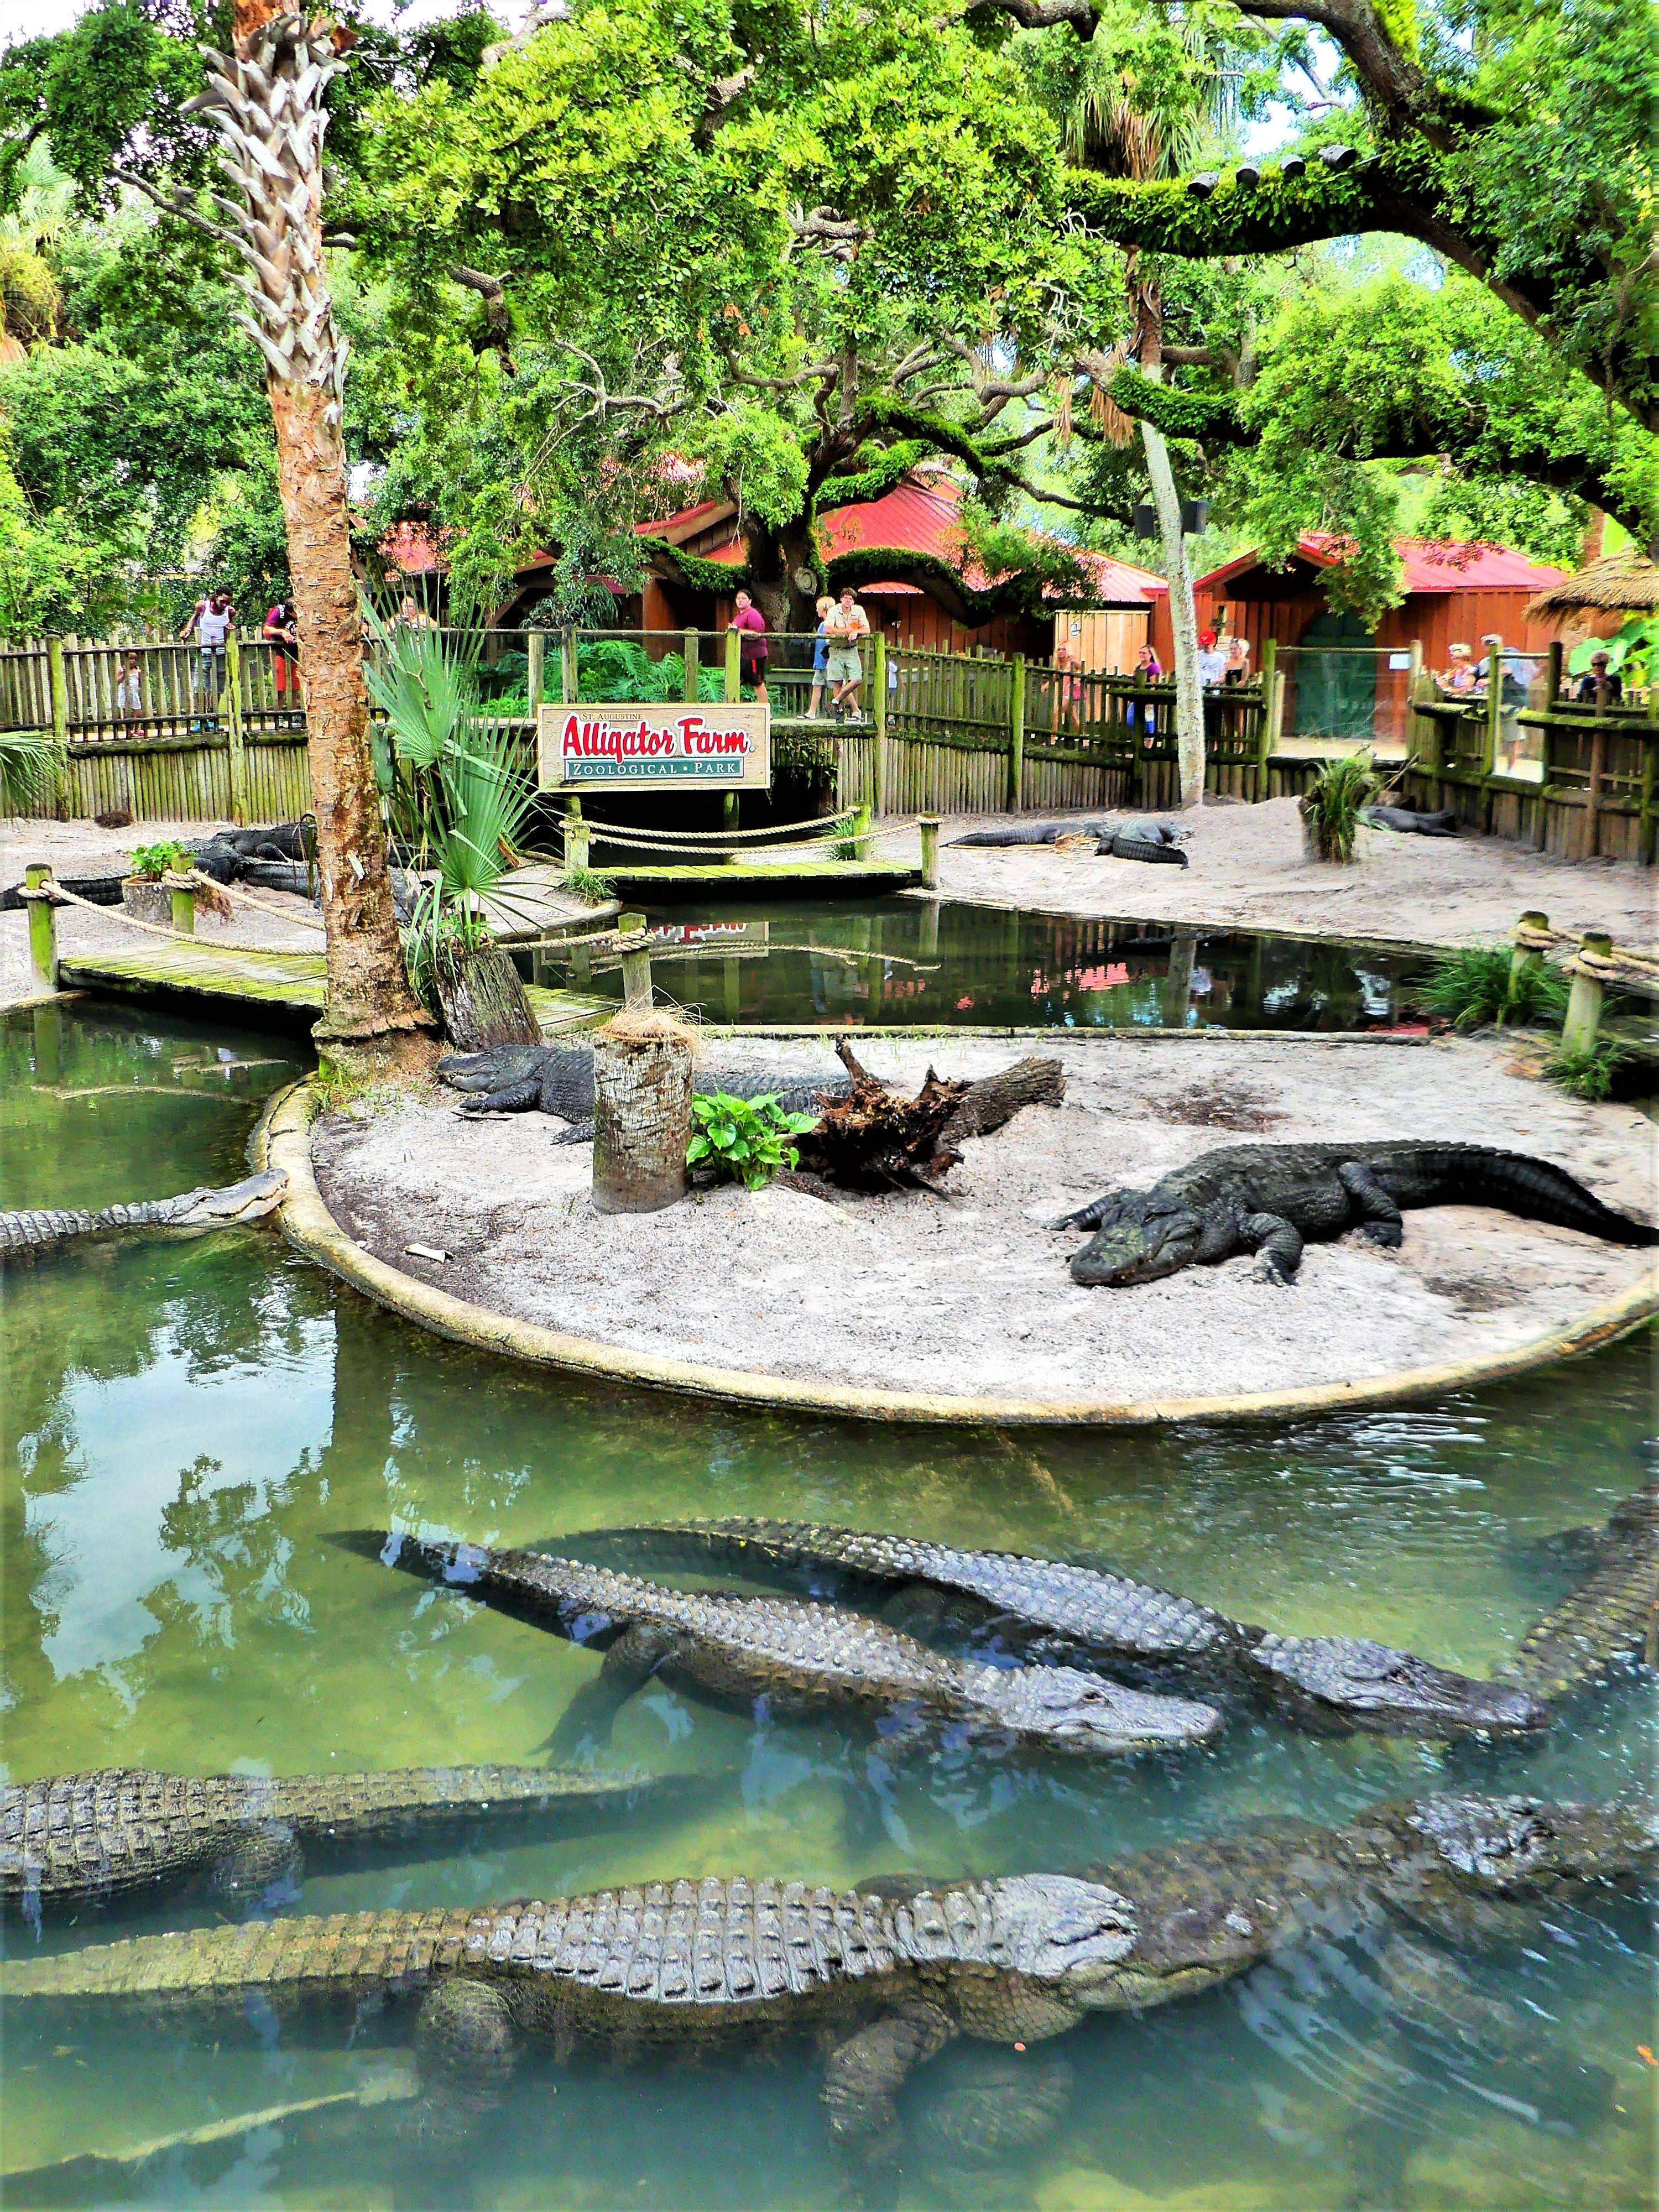 Alligator lagoon.jpg